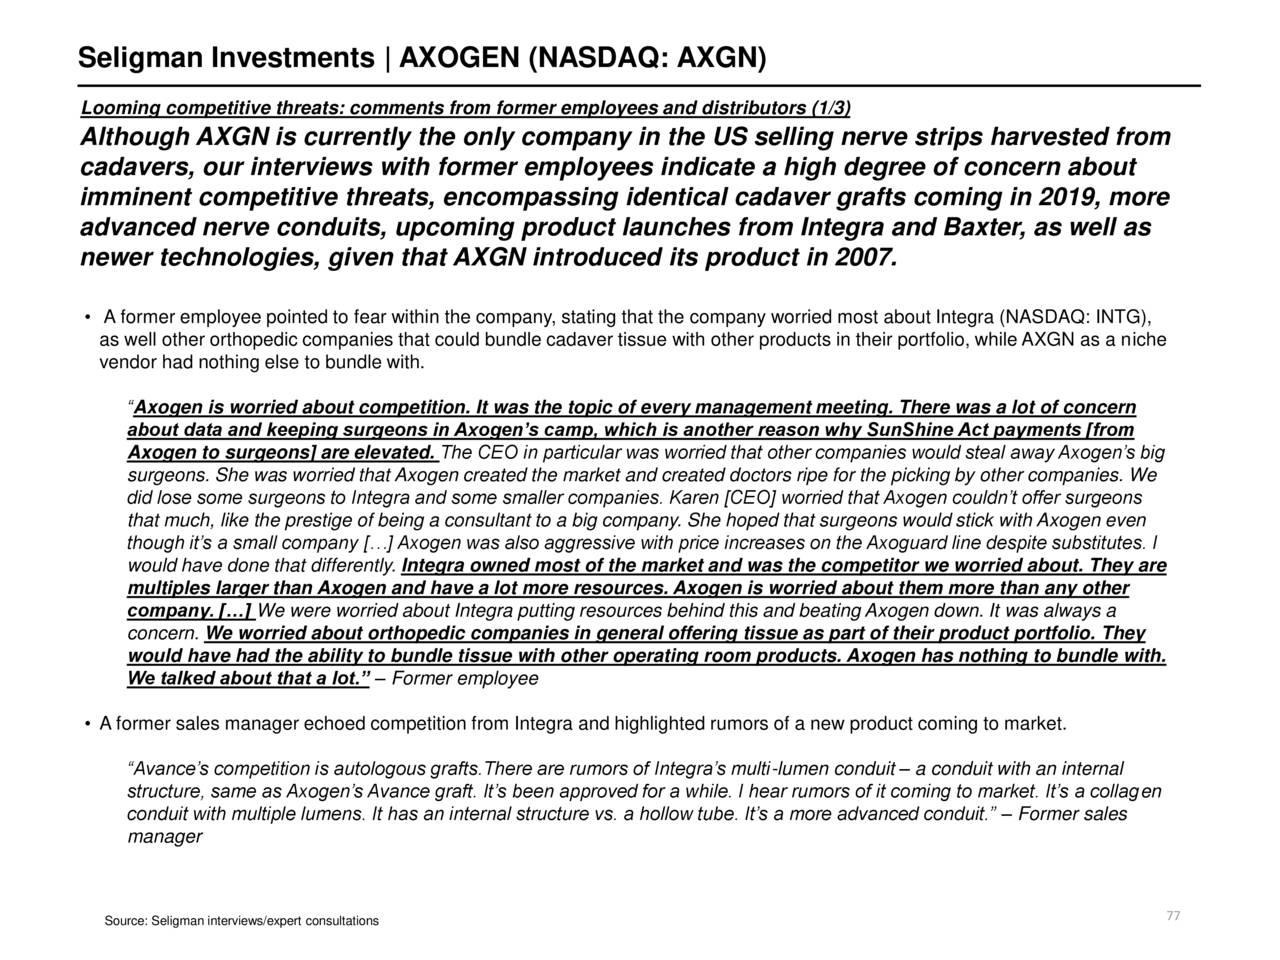 Investments ceo despite smaller